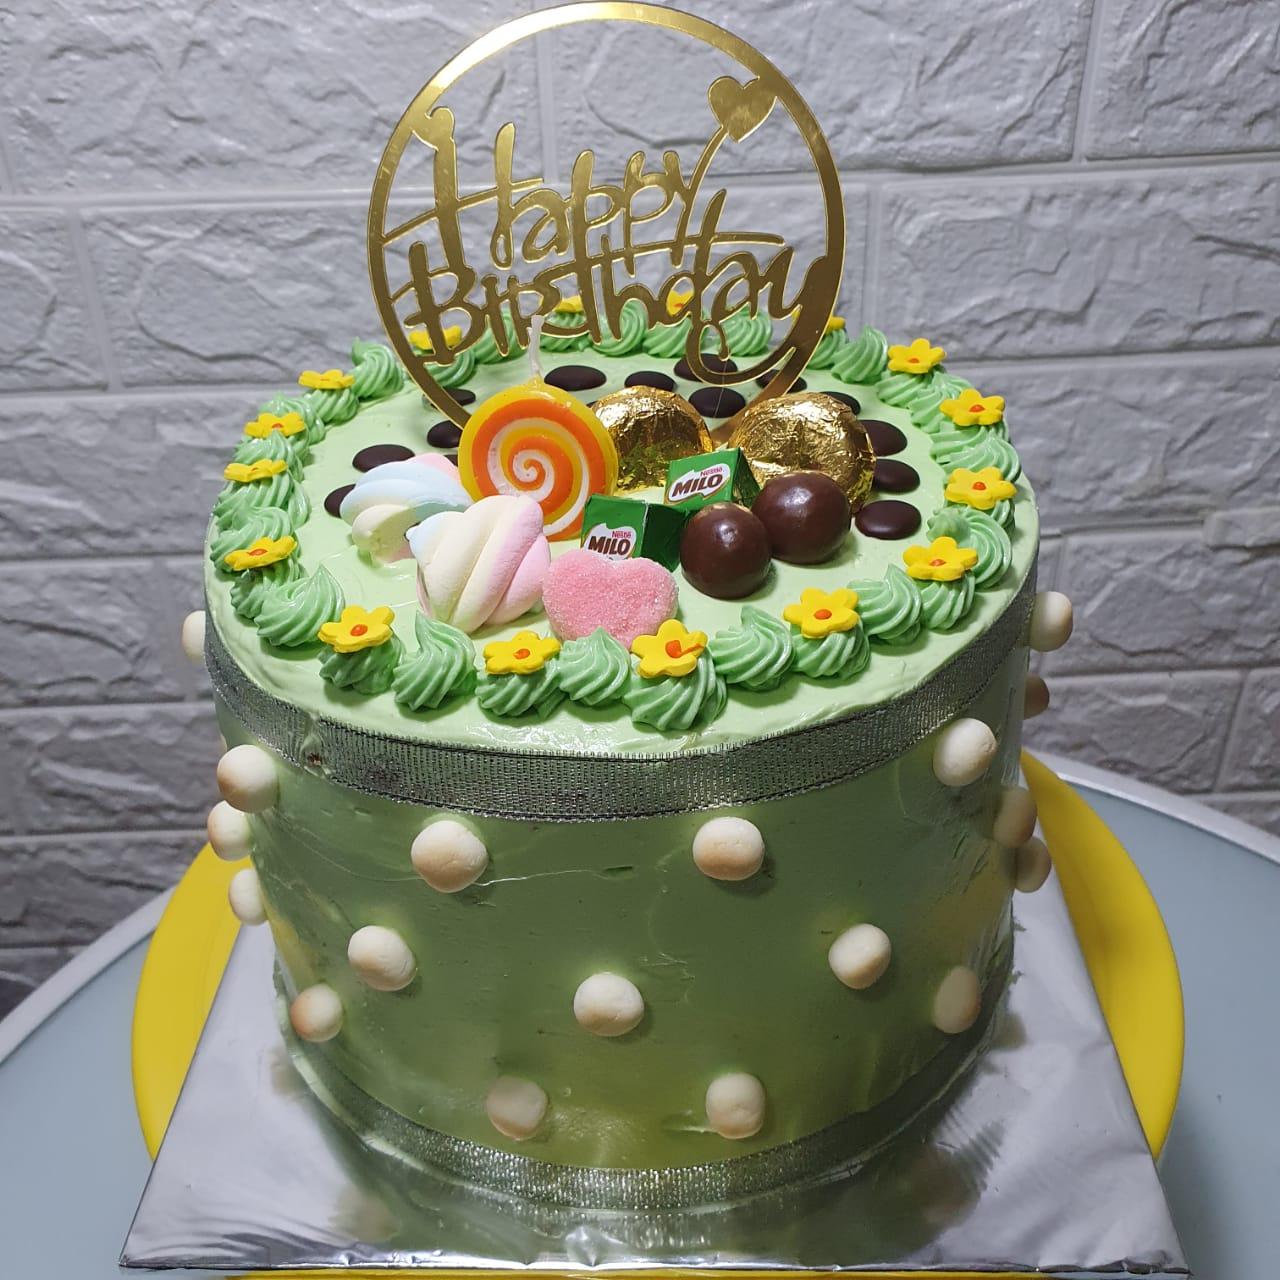 klepon cake 3 layer